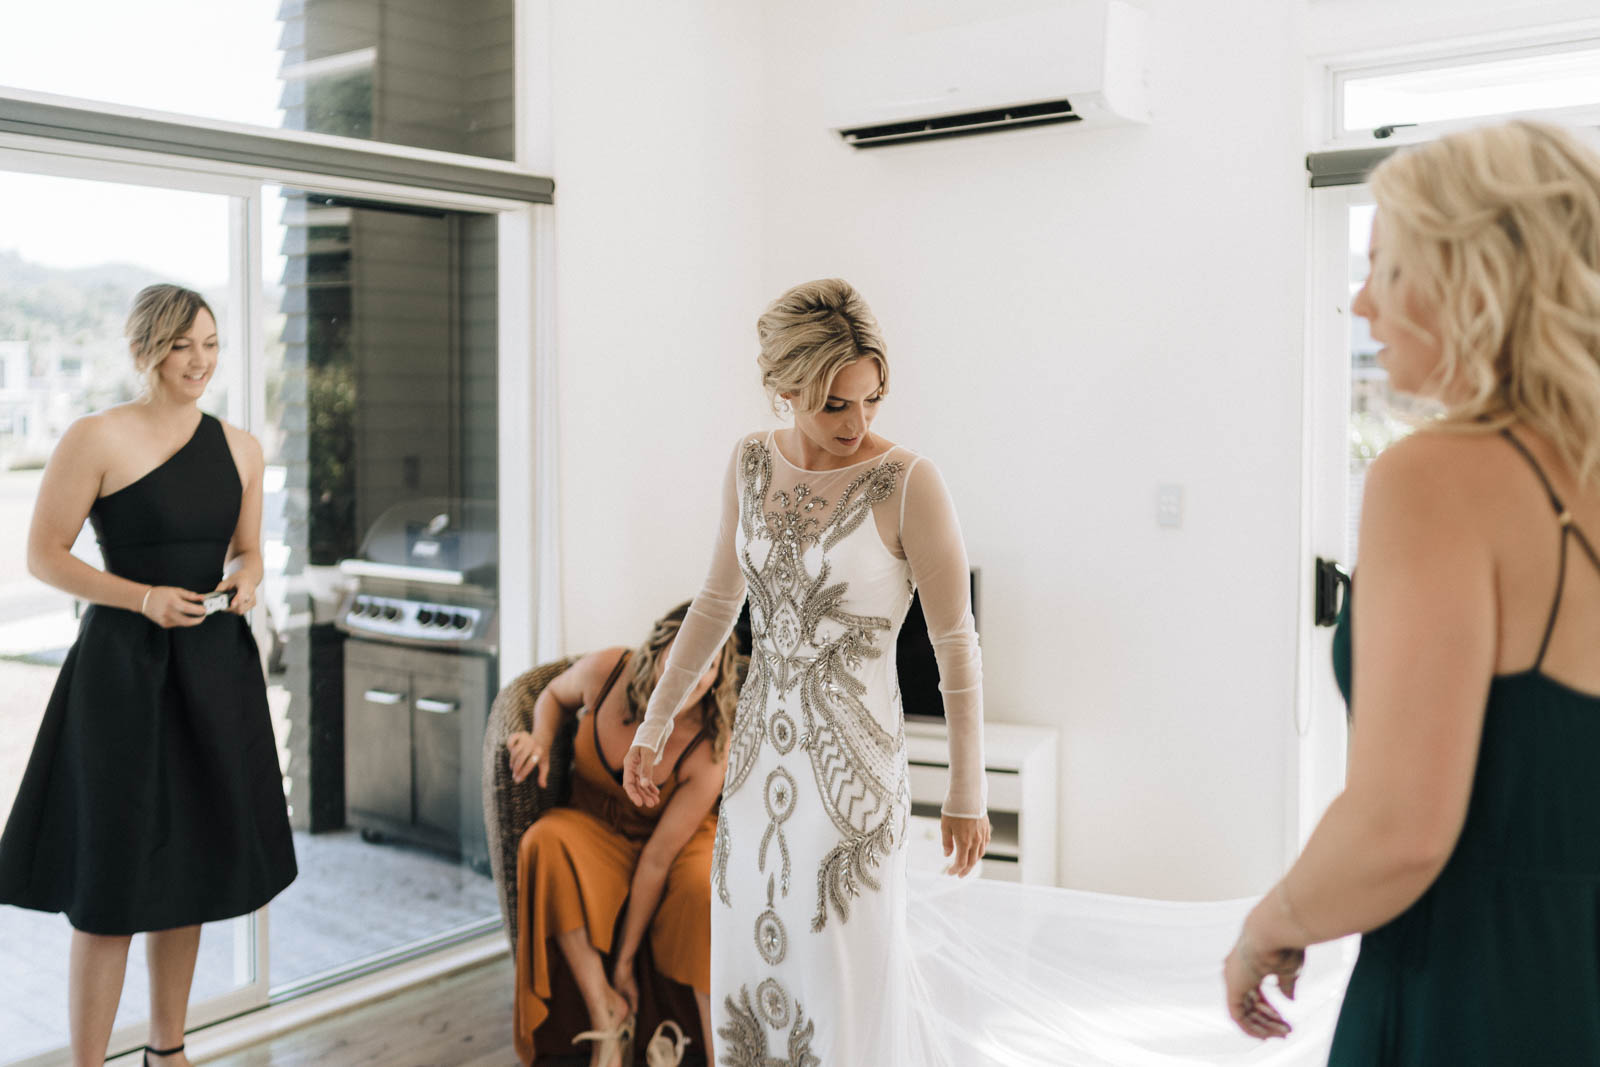 newfound-l-i-coromandel-wedding-photographer-1529-A9_02559